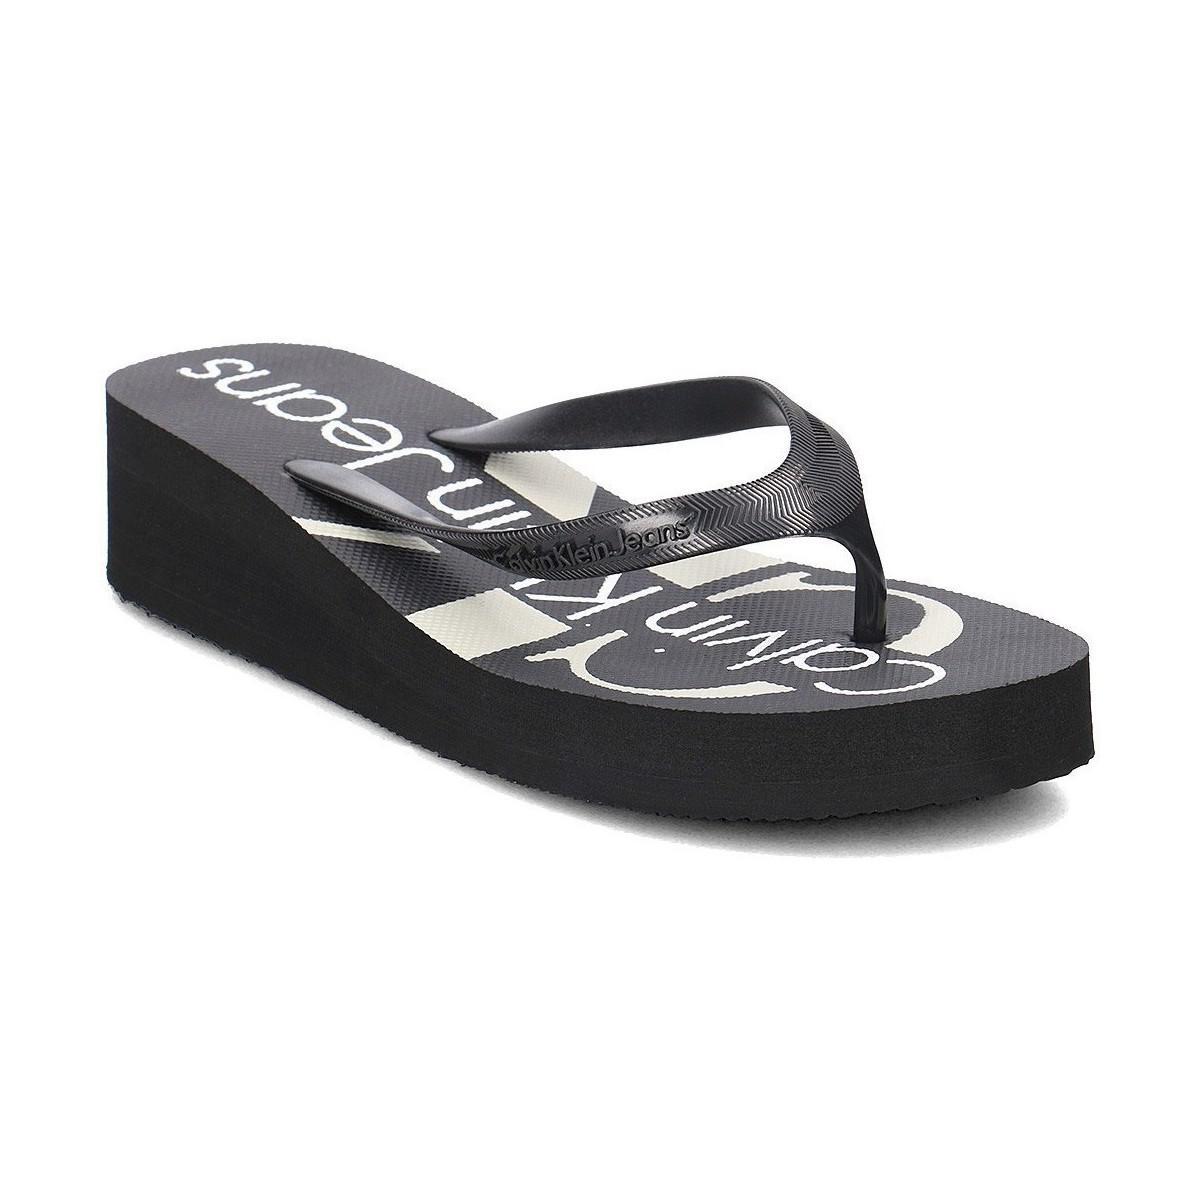 babb21a0f Calvin Klein Re9734 Women s Flip Flops   Sandals (shoes) In Black in ...